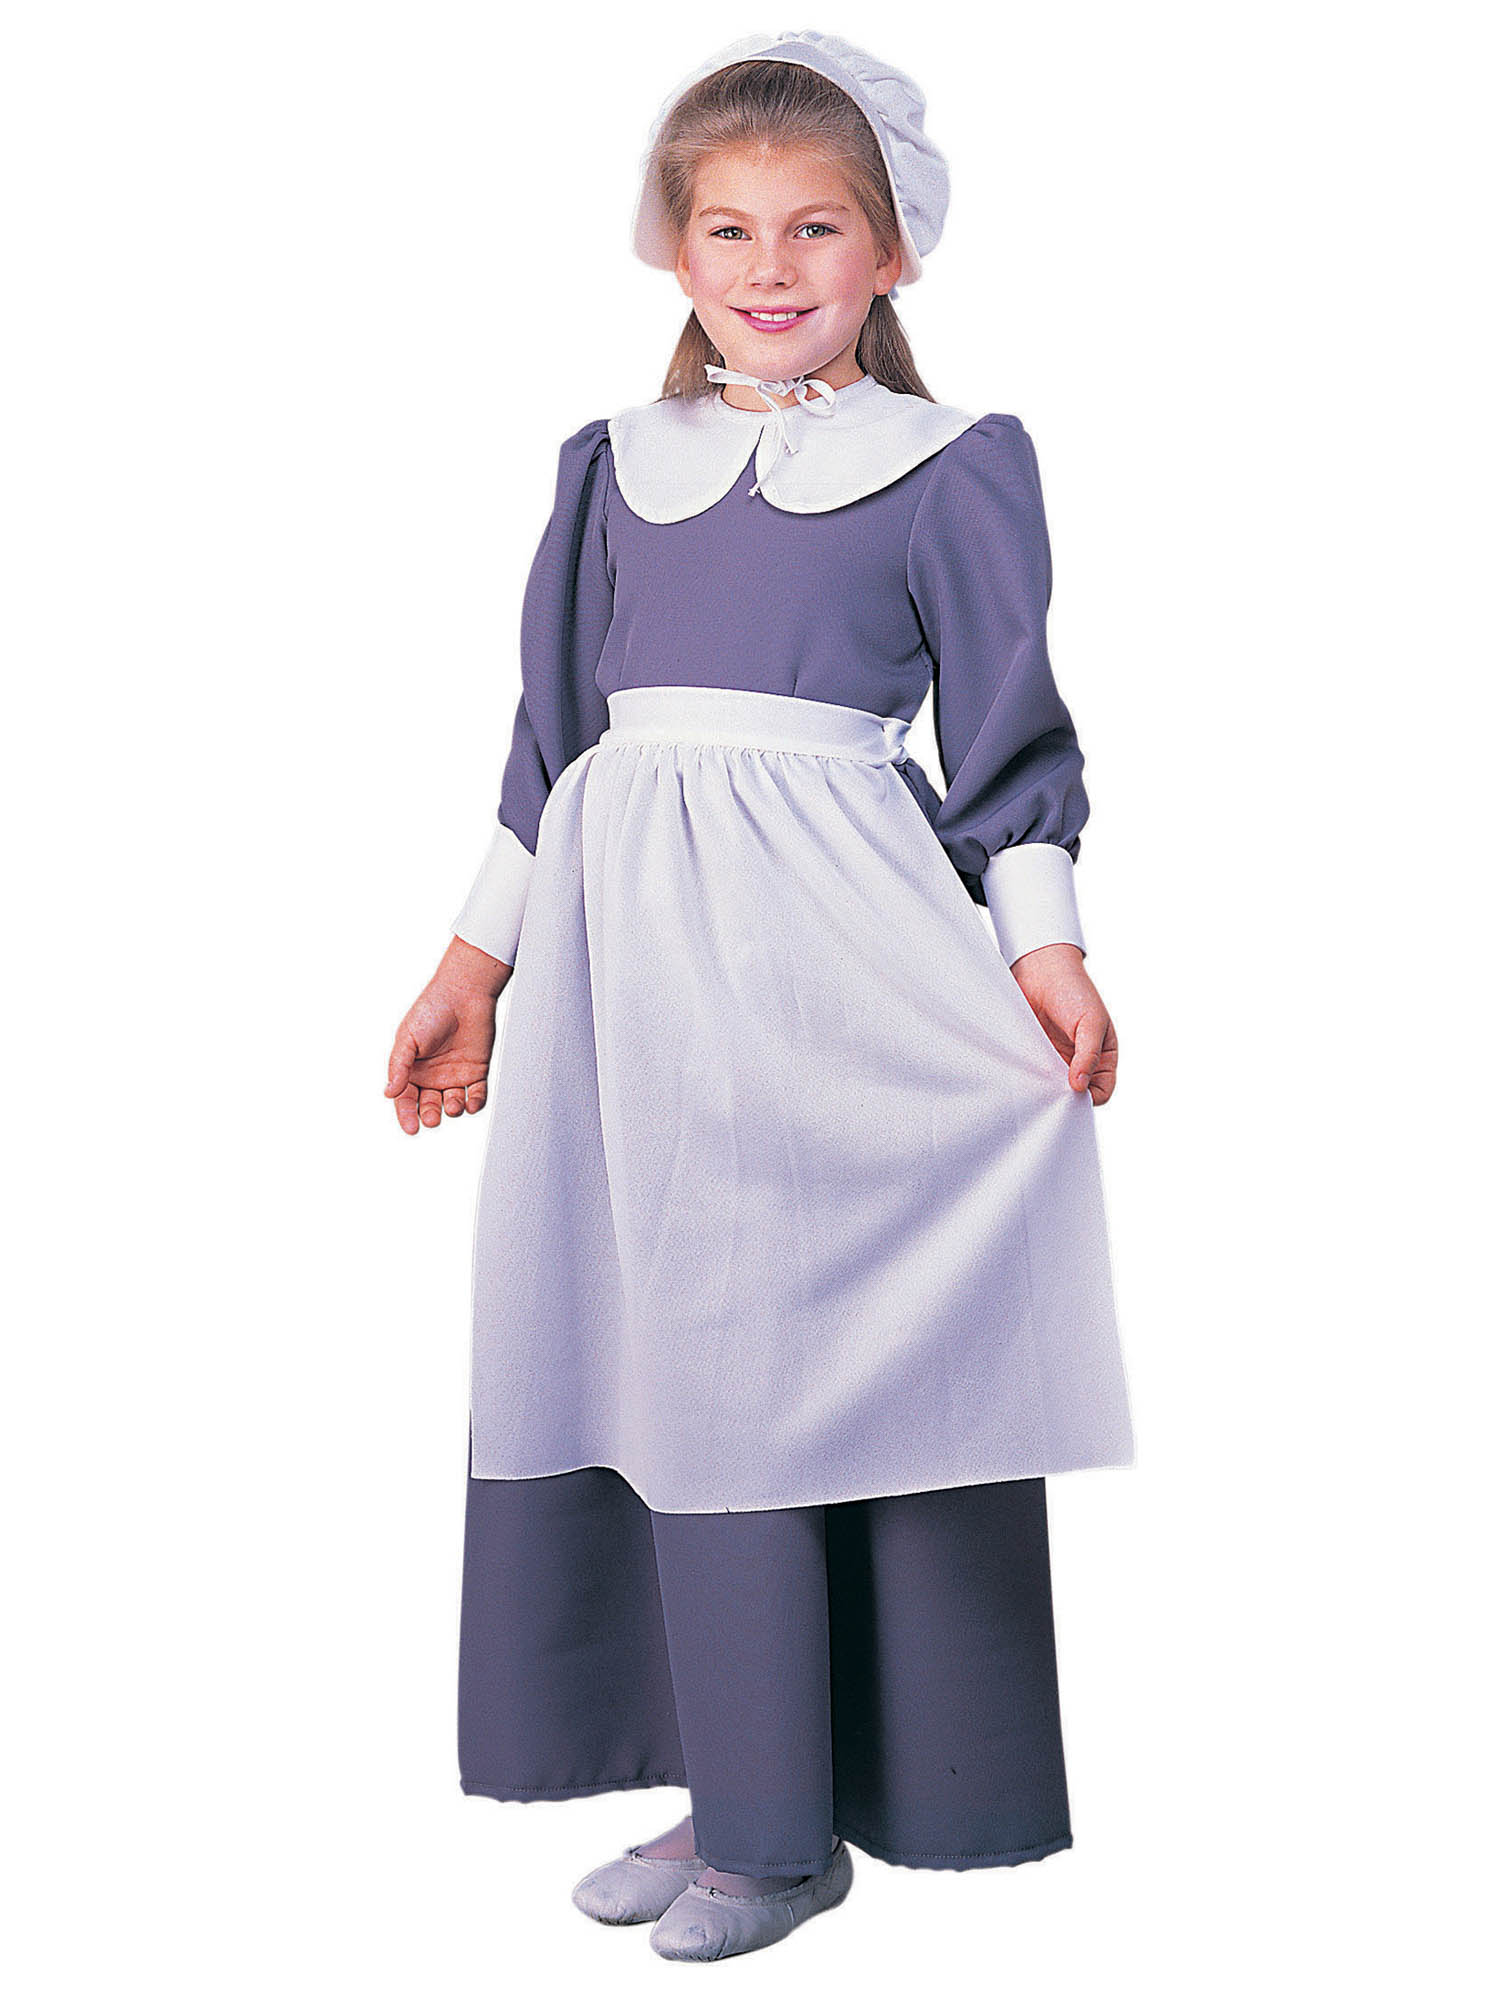 PIONEER GIRL CHILD PILGRIM PURITAN COLONIAL PRAIRIE VICTORIAN KIDS COSTUME